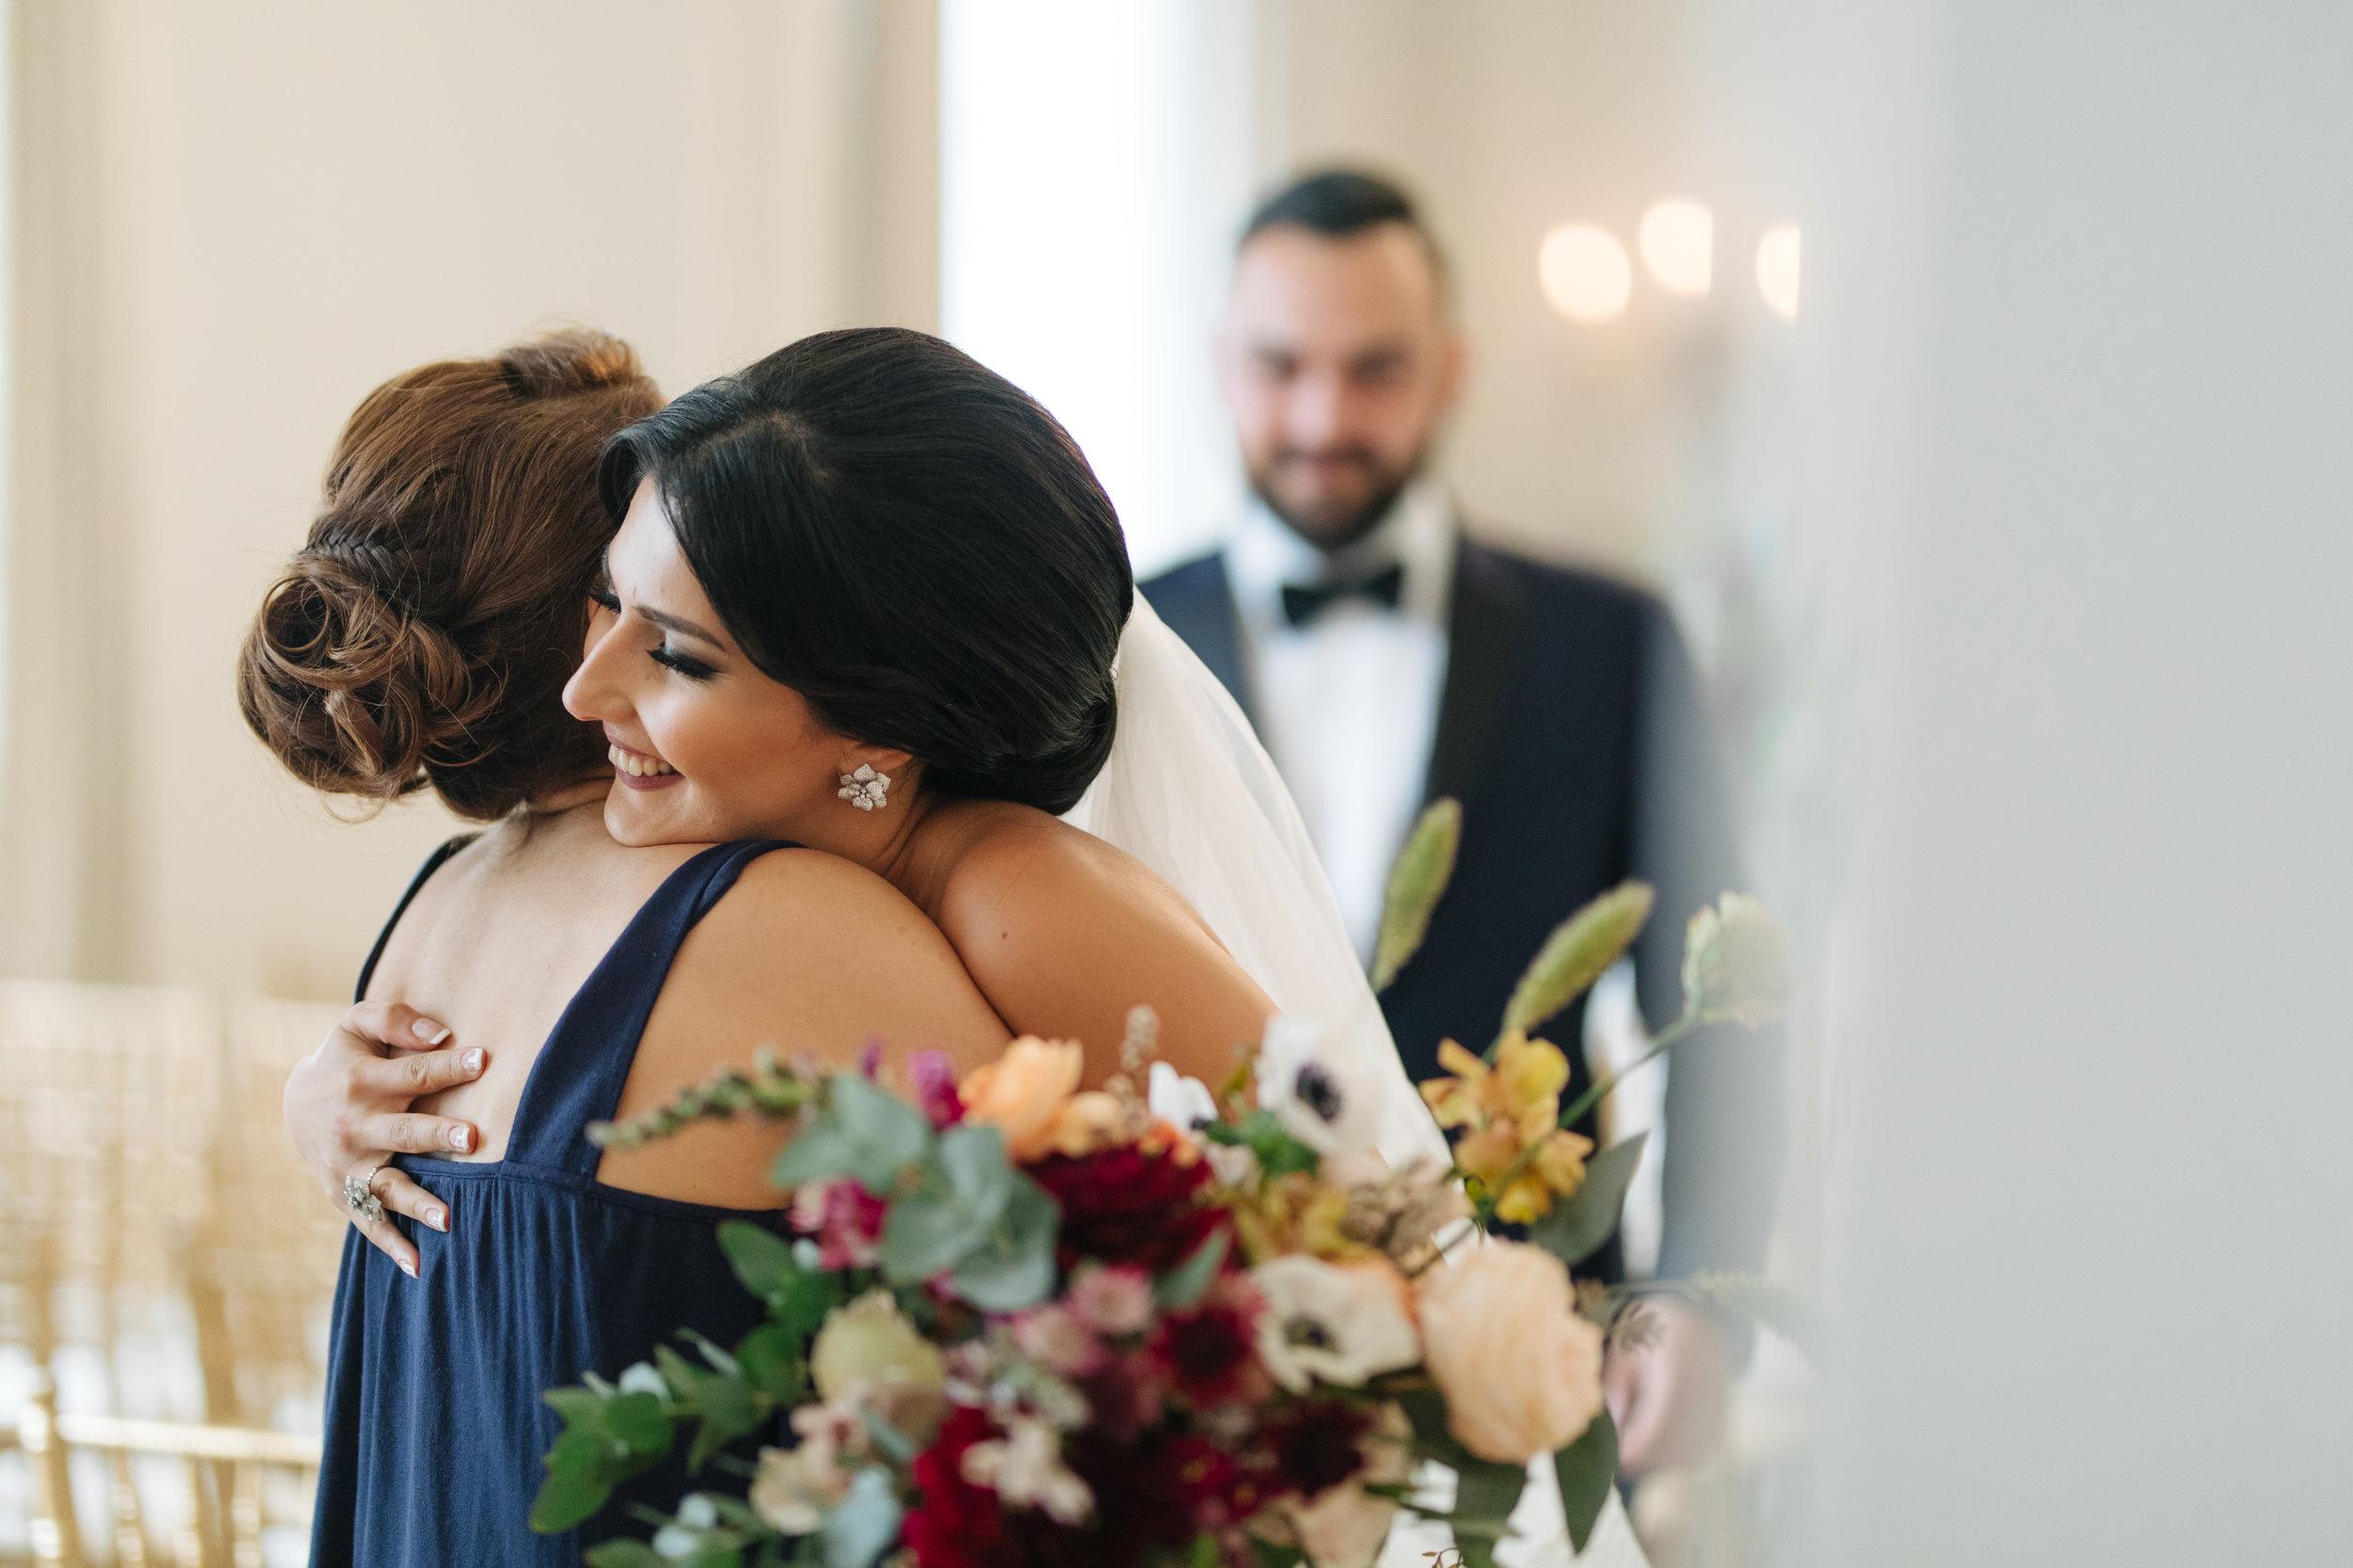 herastudios_wedding_mina_sina_collectors_package-143.jpg